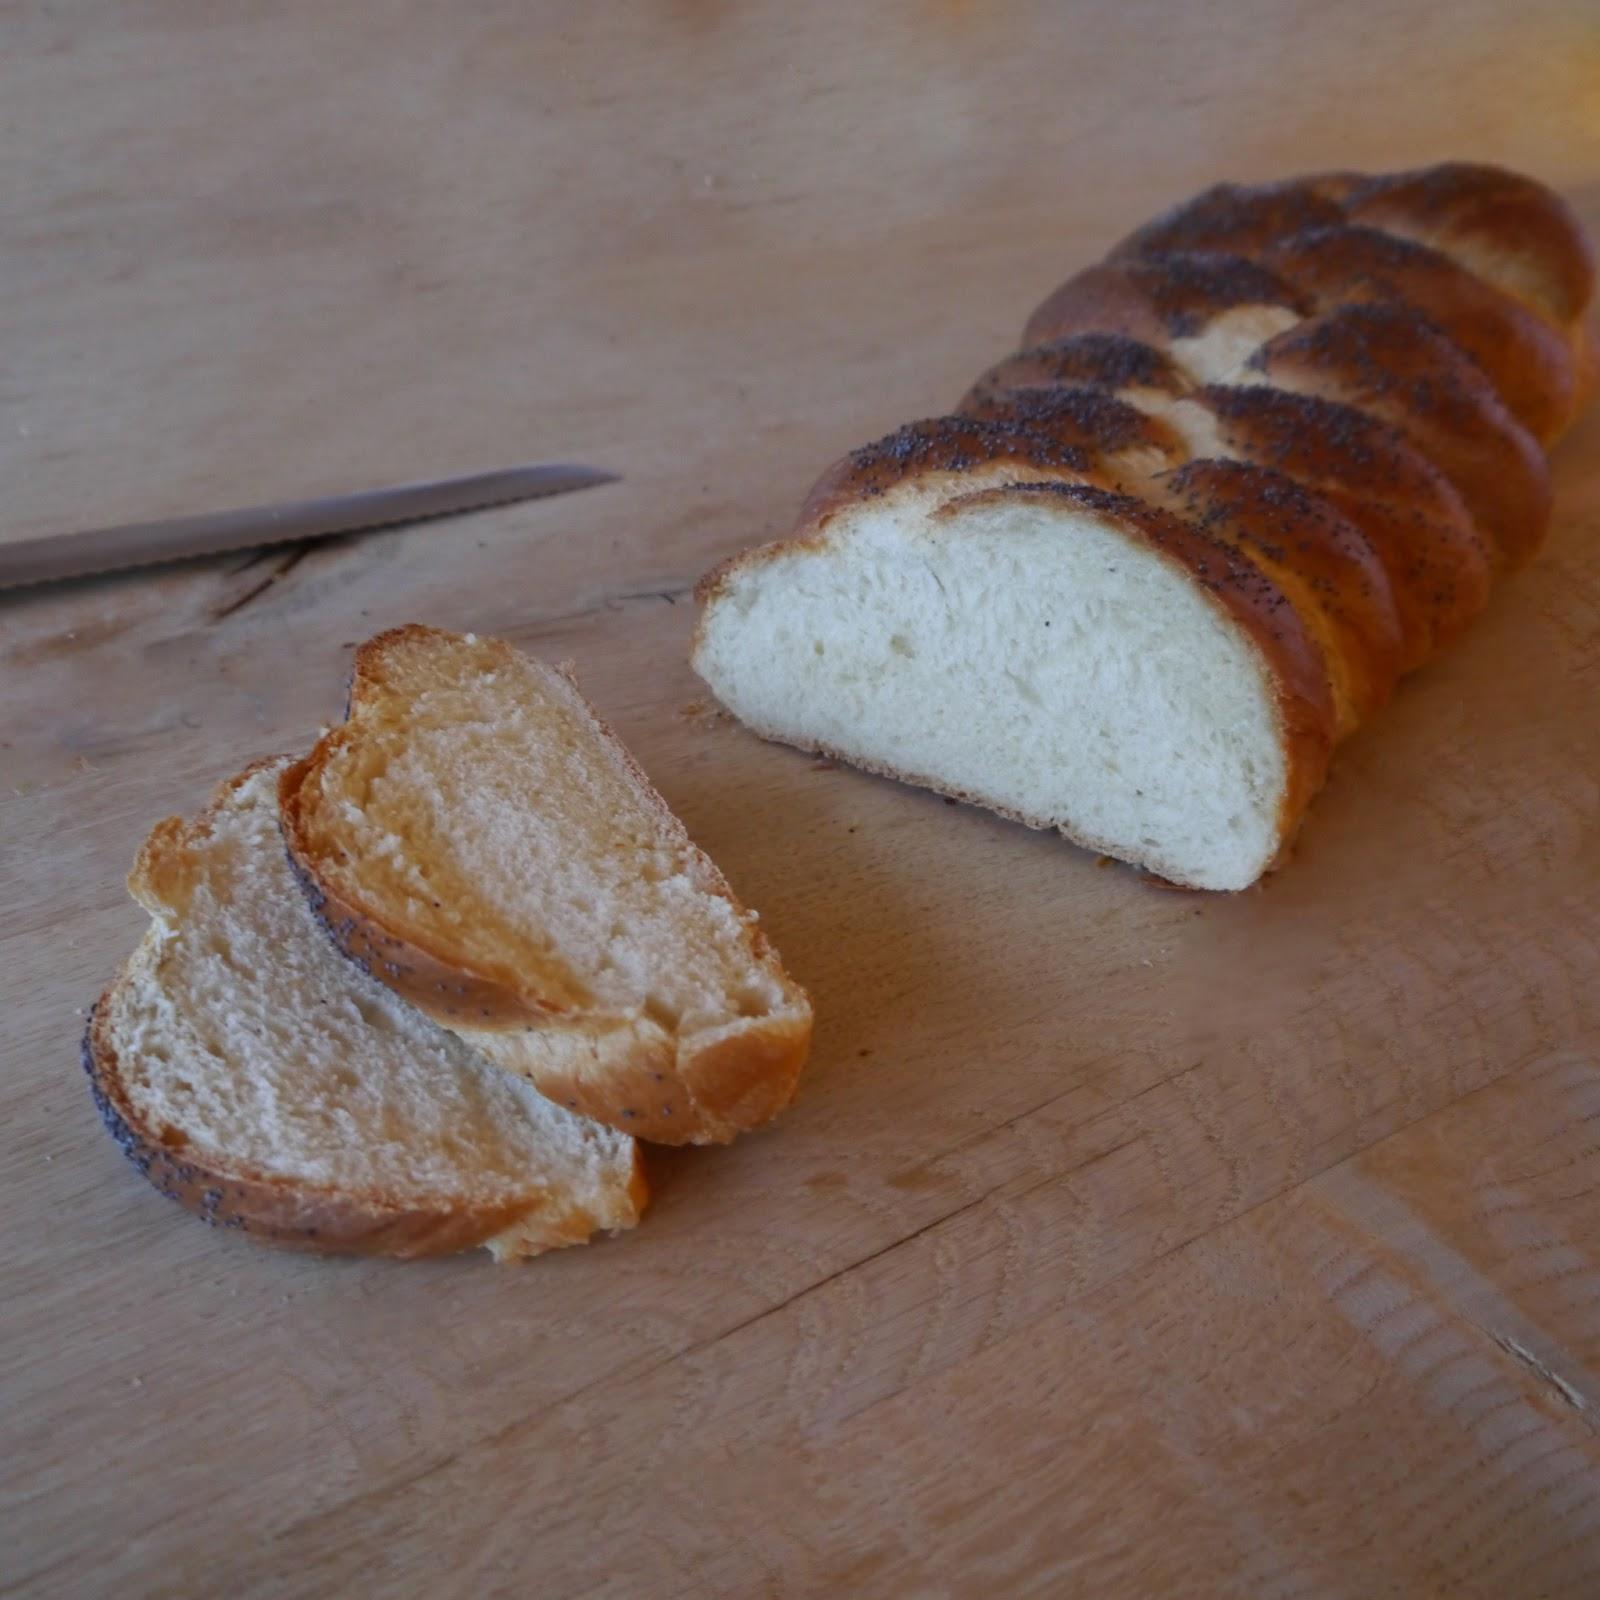 Makes 1 large challah bread